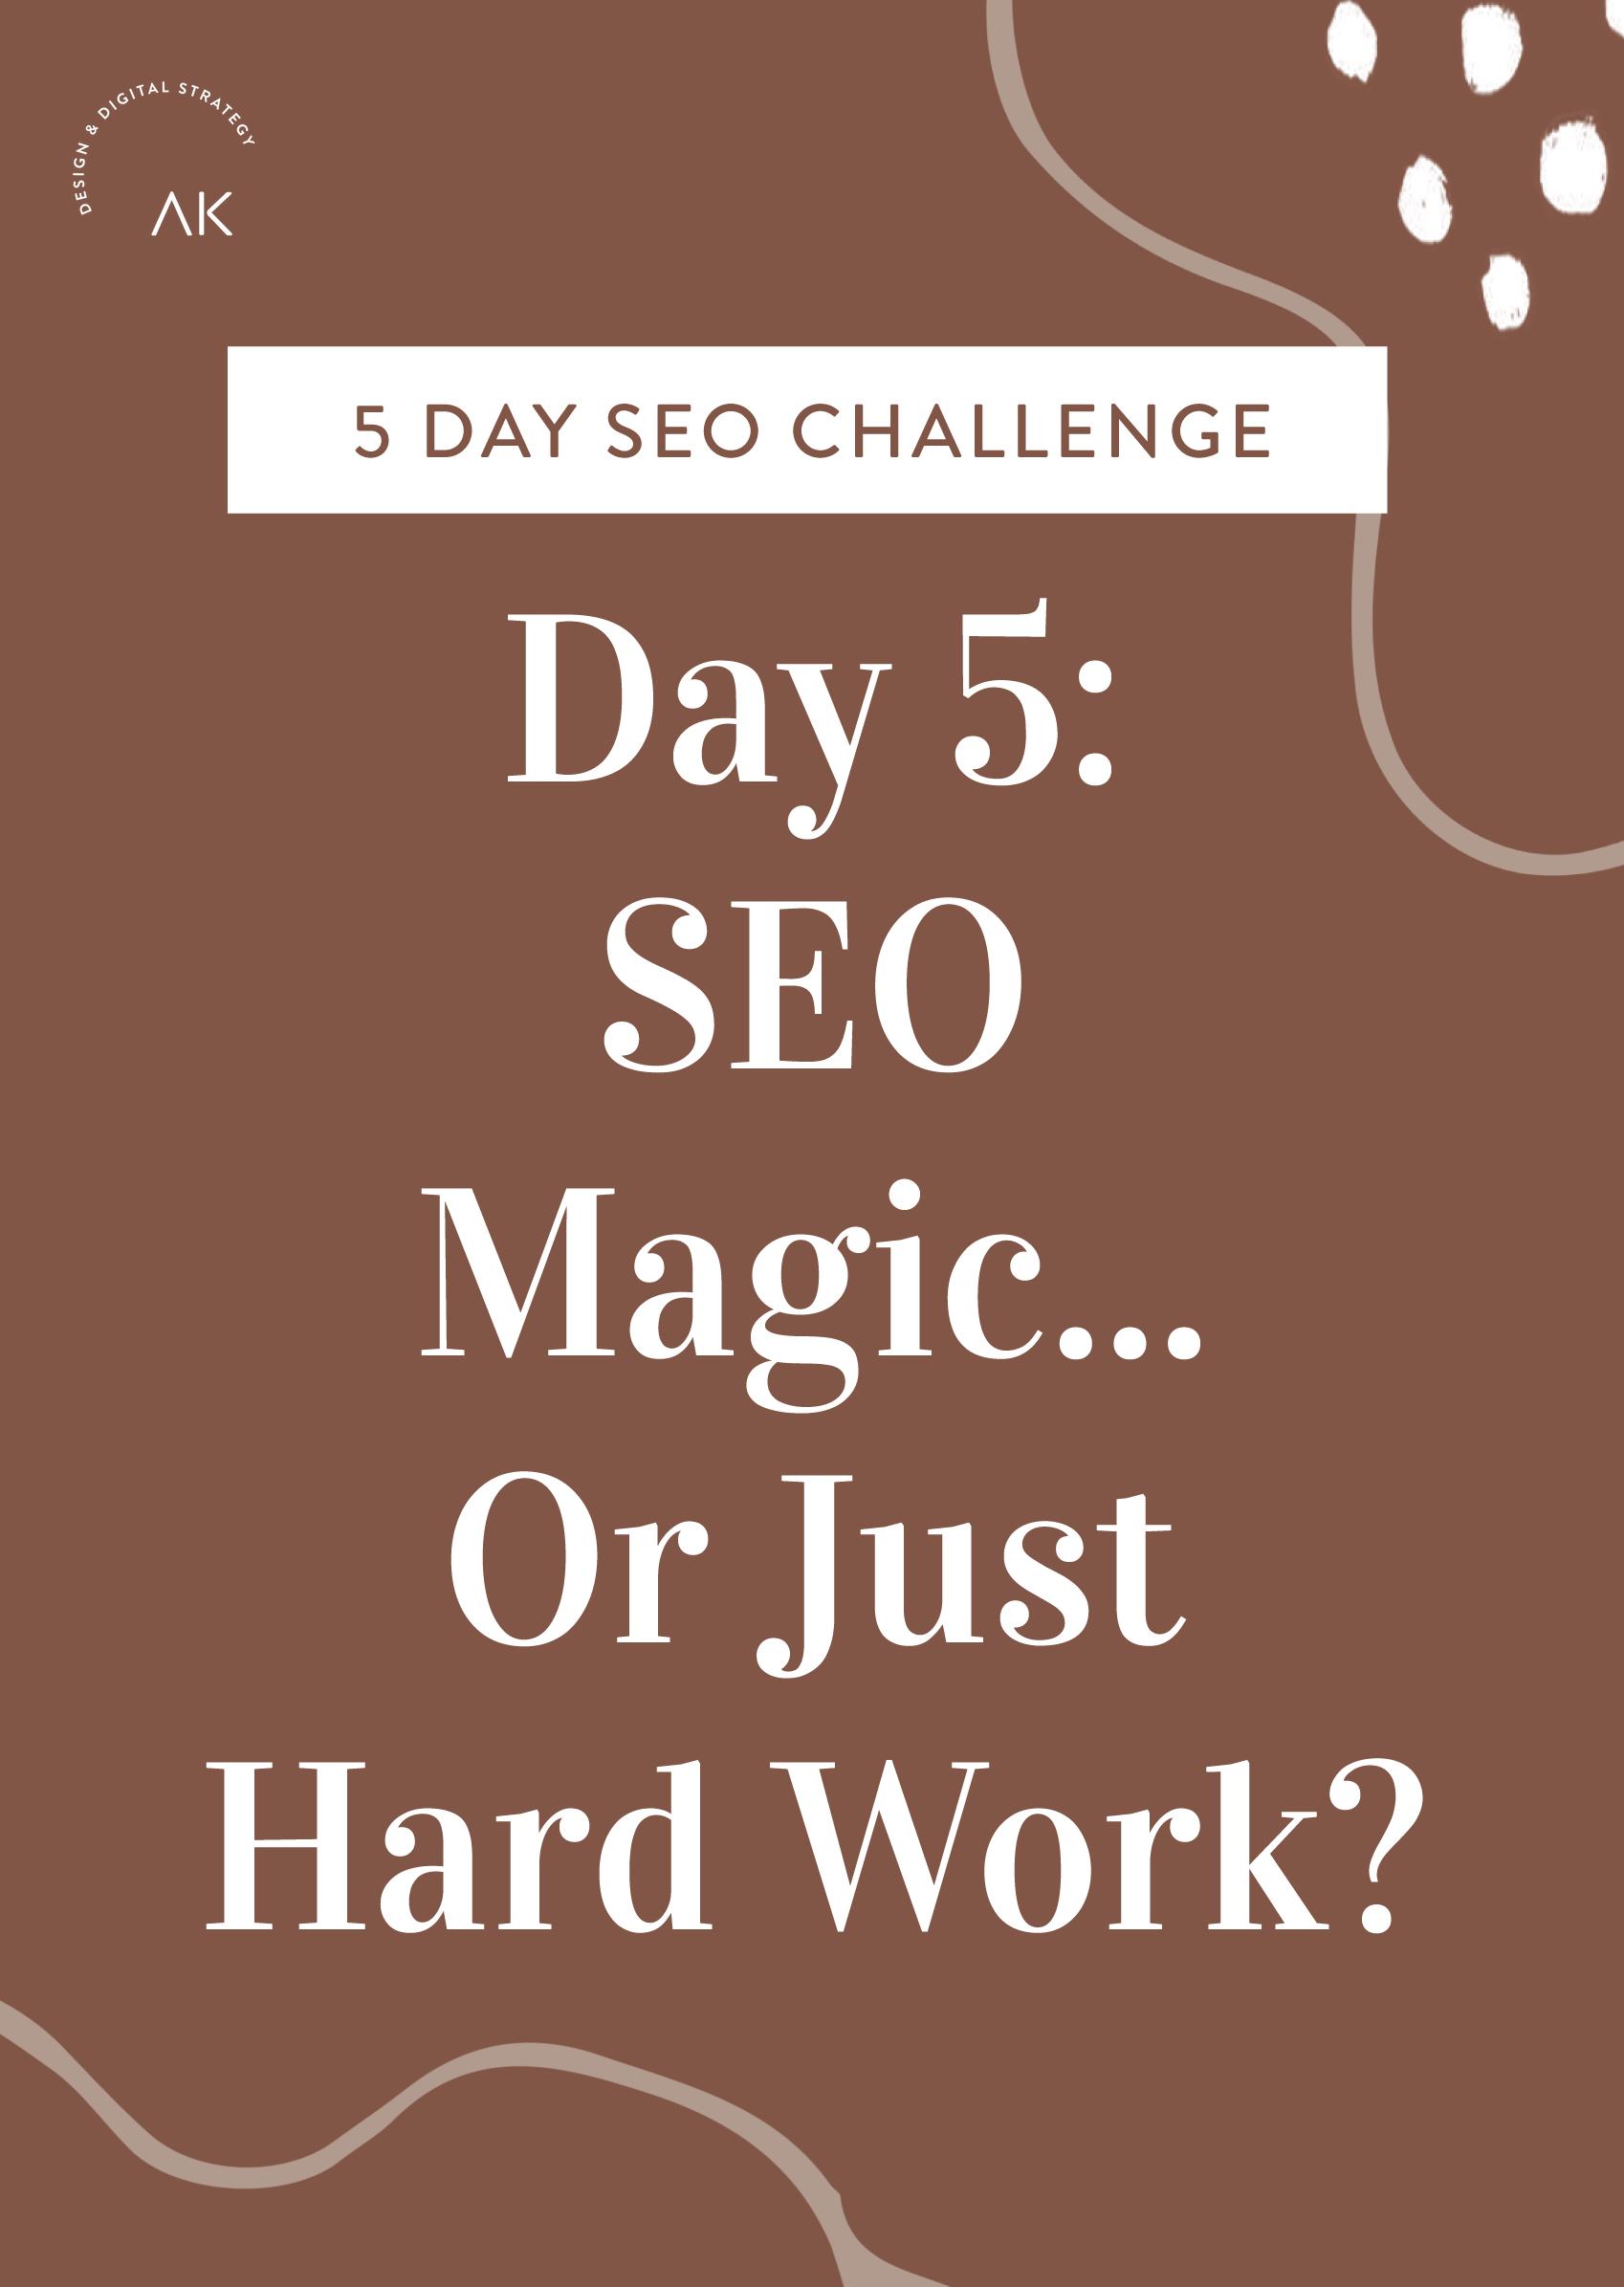 Day 5 SEO Challenge